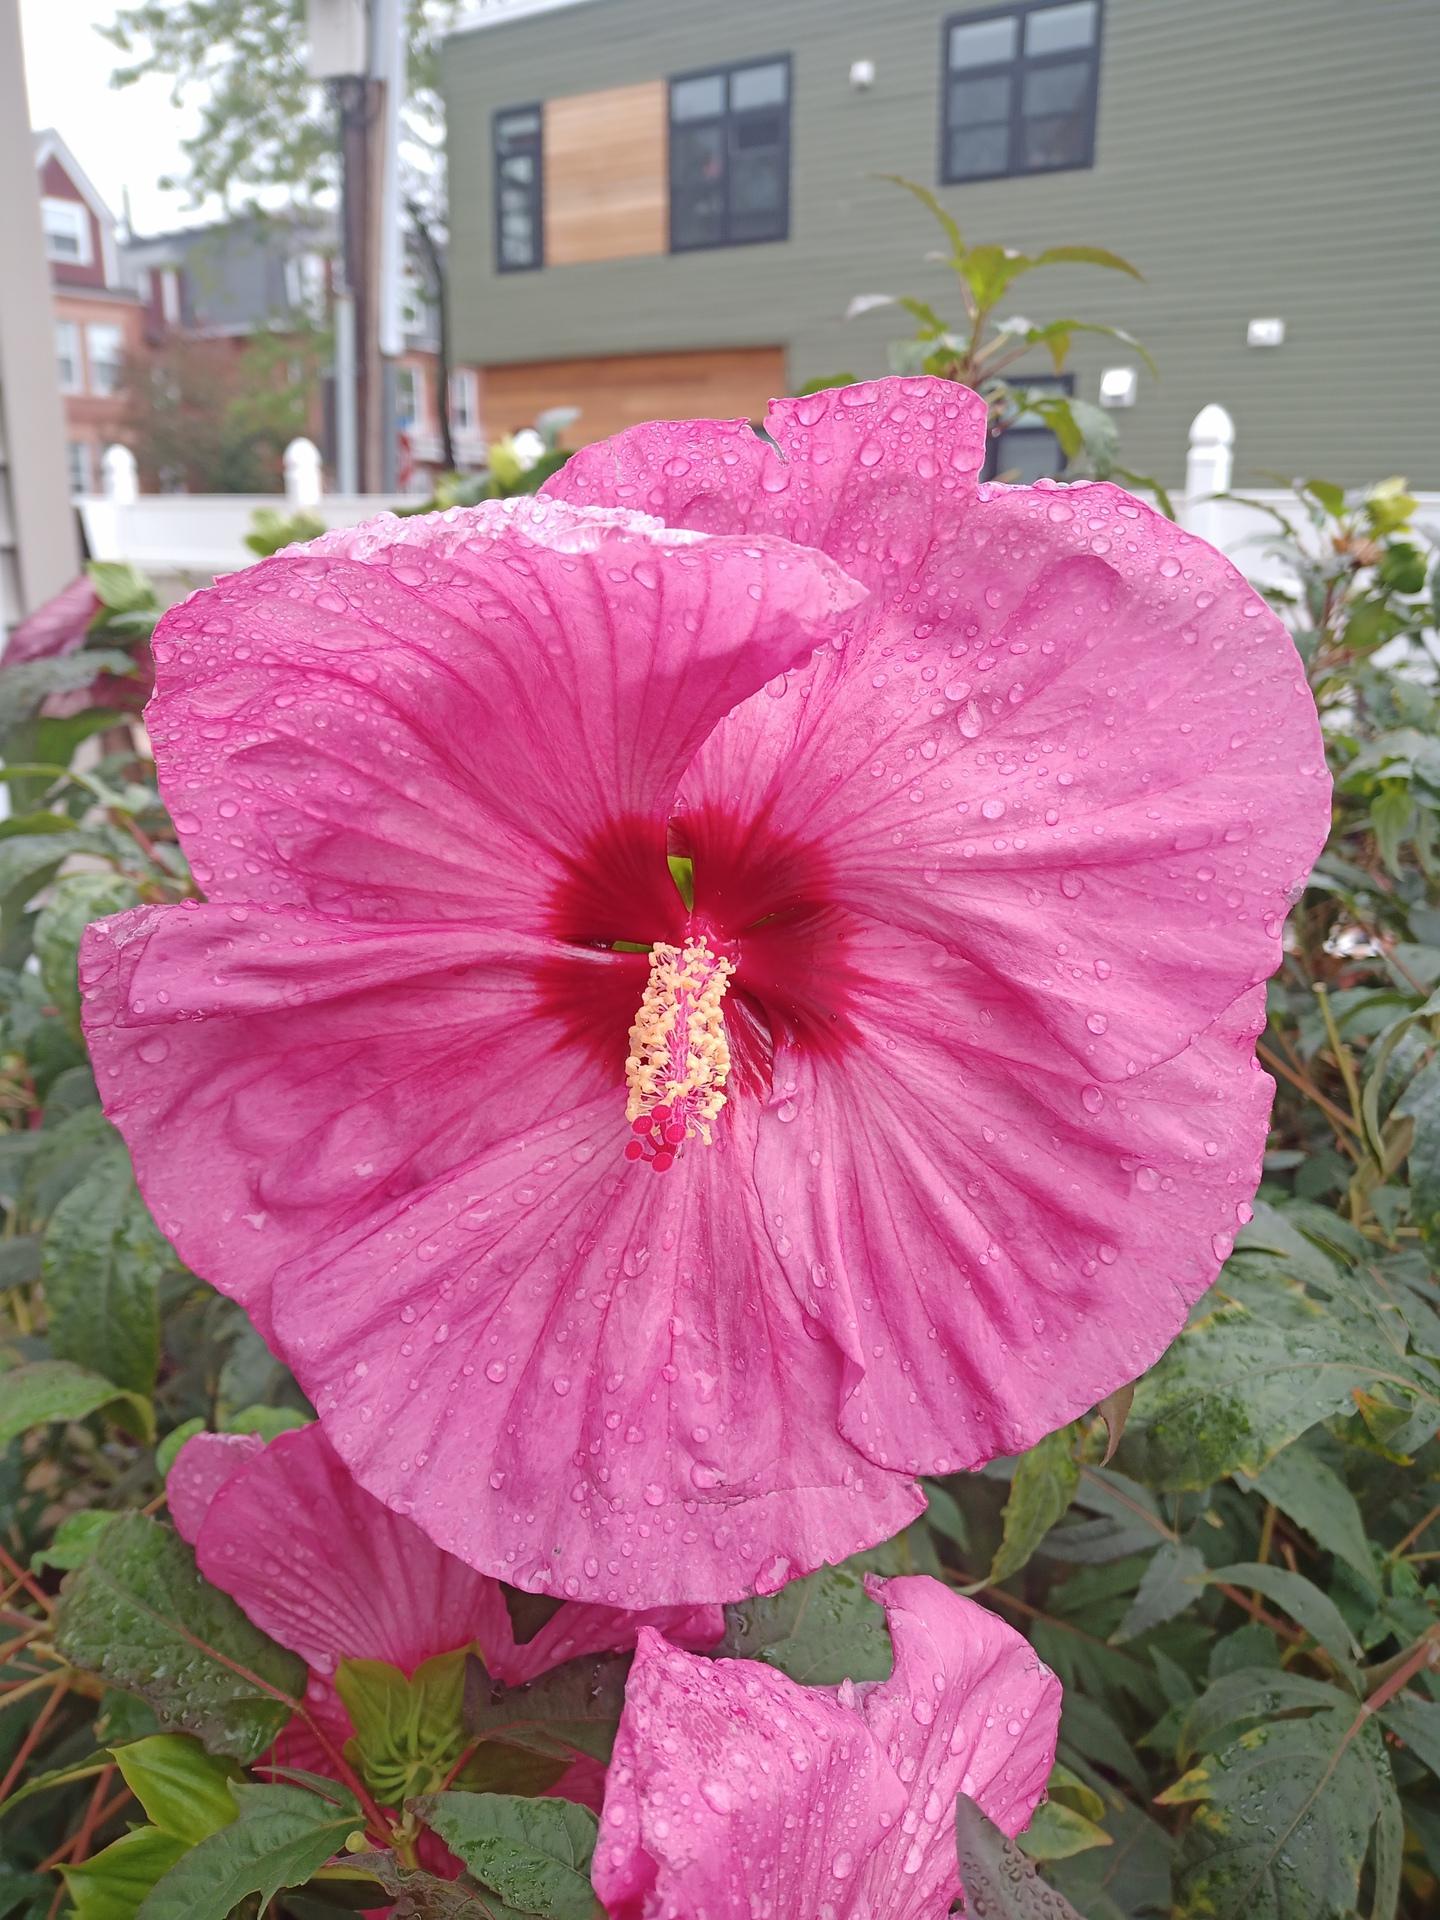 Photo of flower taken on Doogee S97 Pro